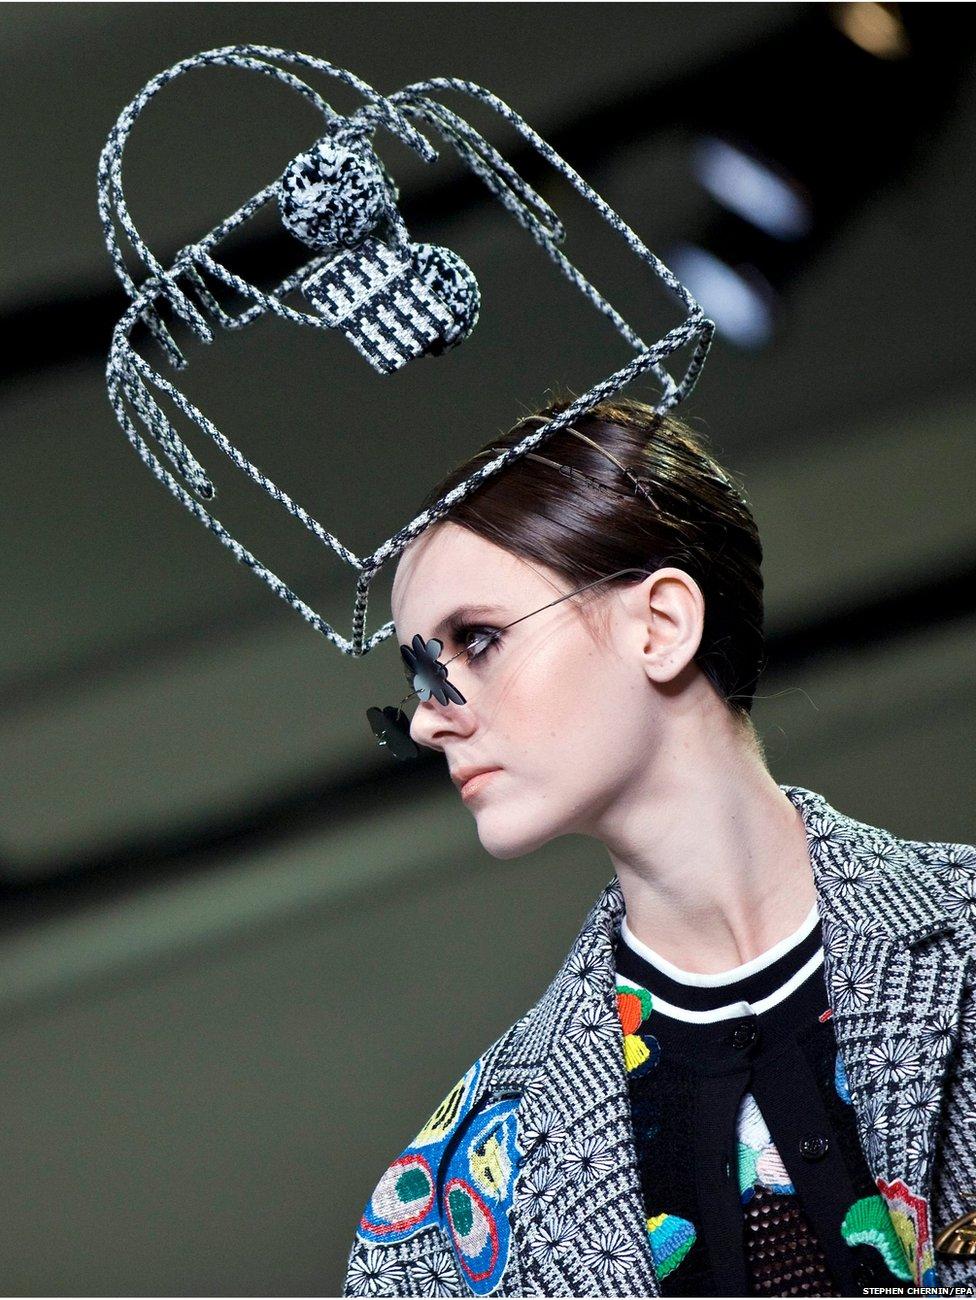 Model at New York Fashion Week